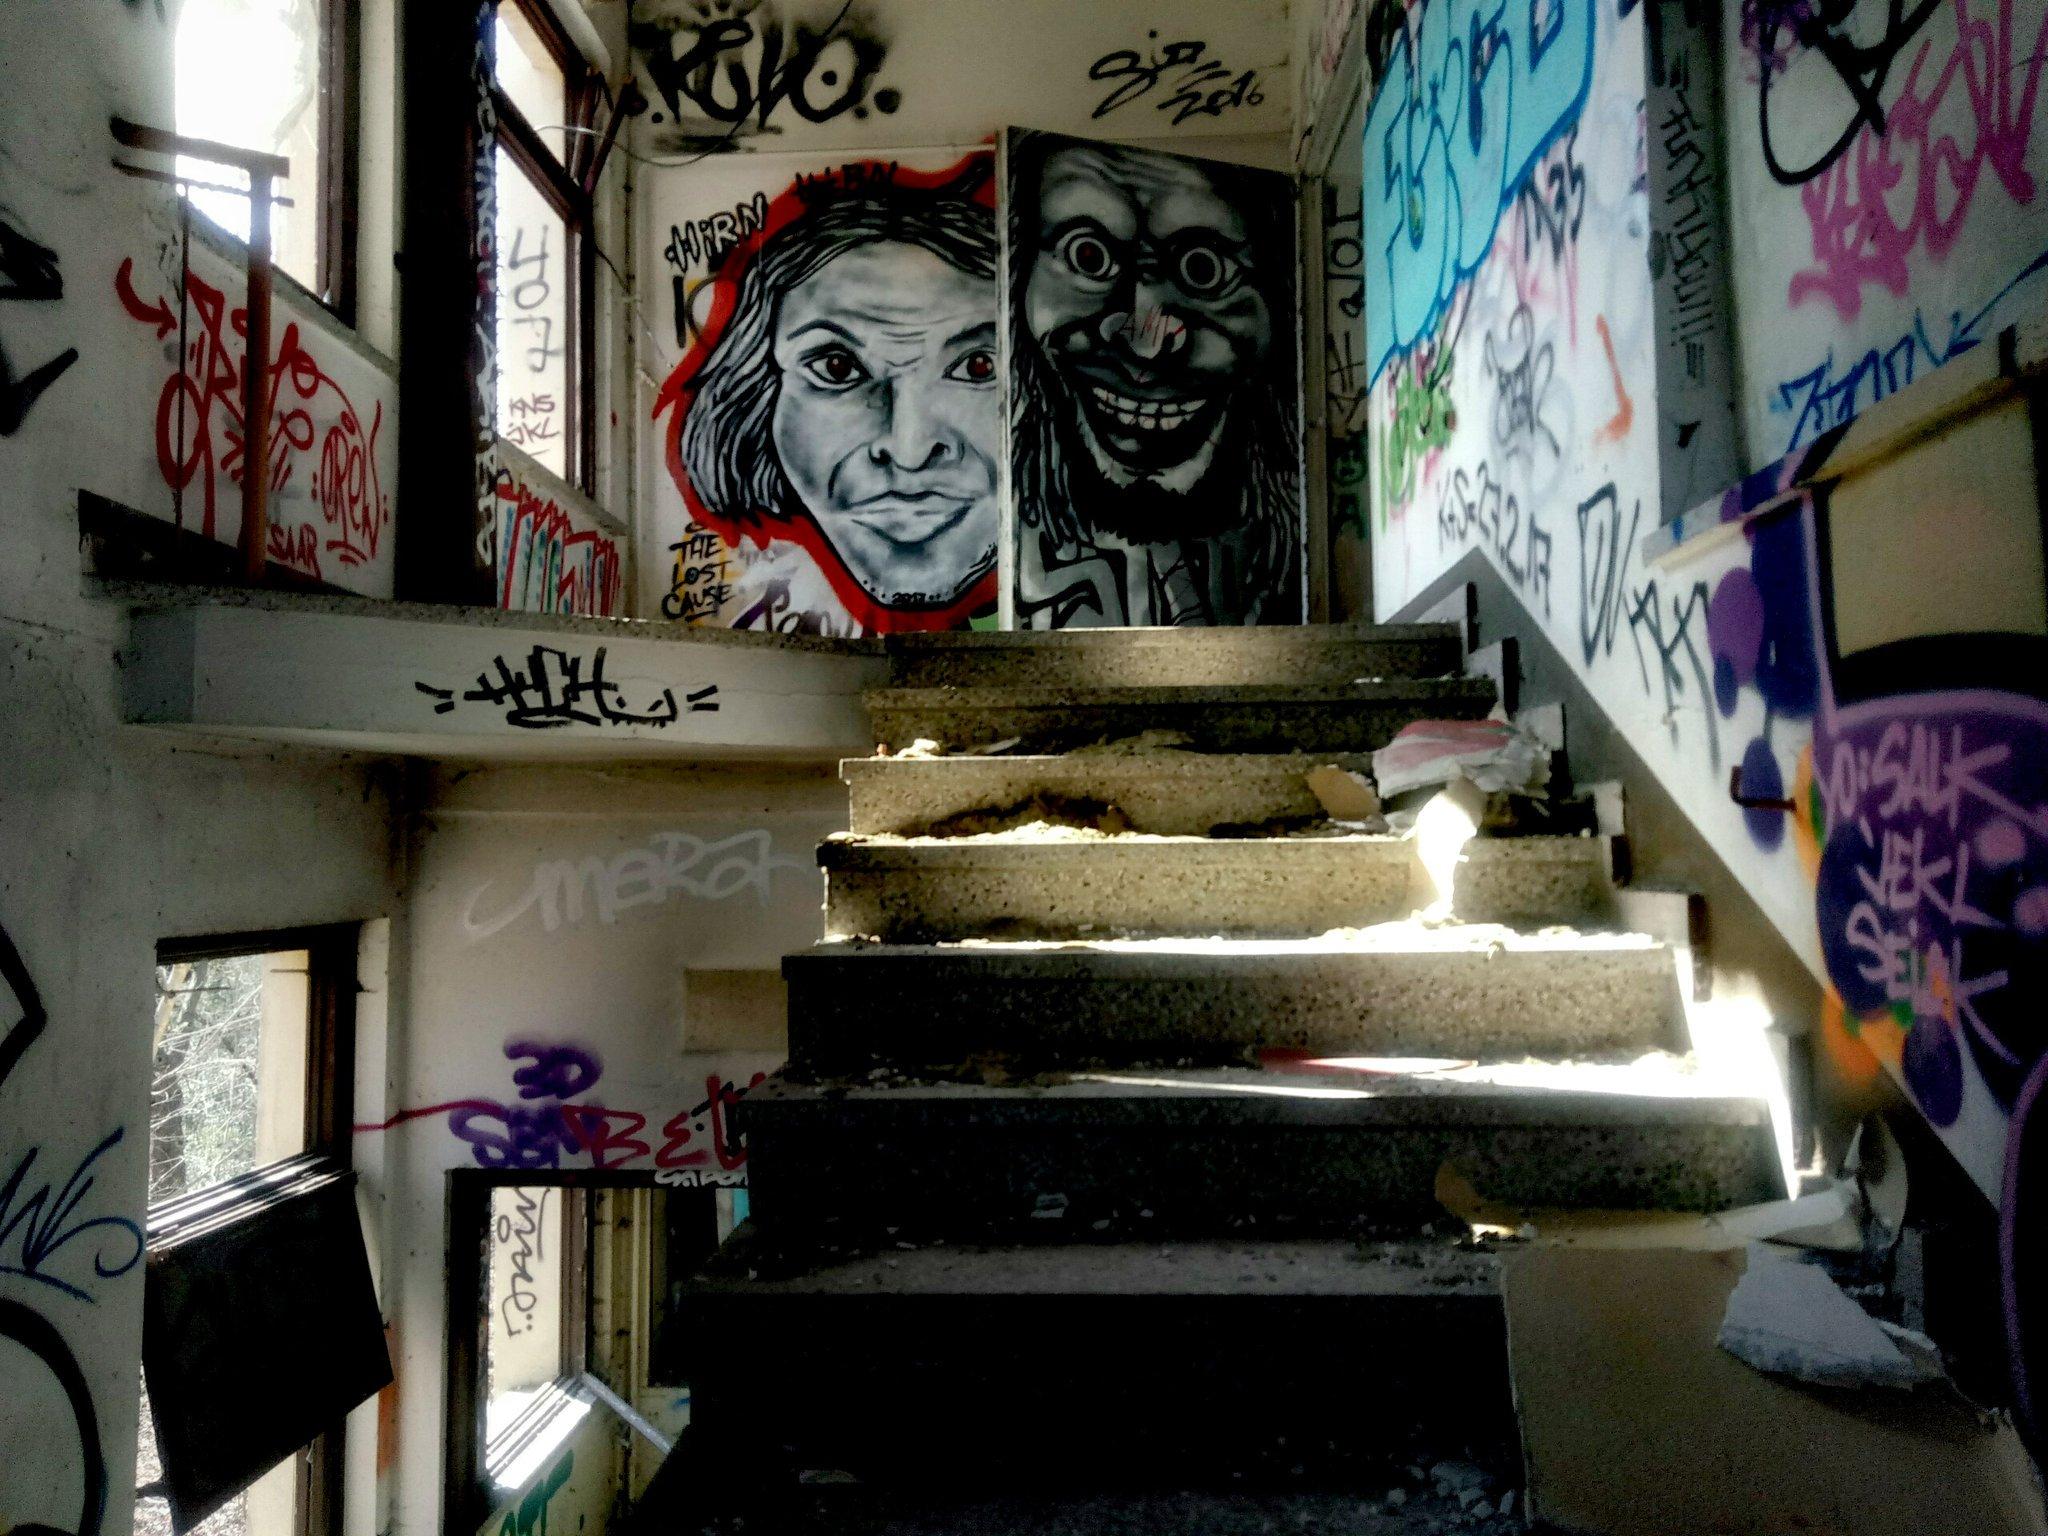 ospedale fantasma 2